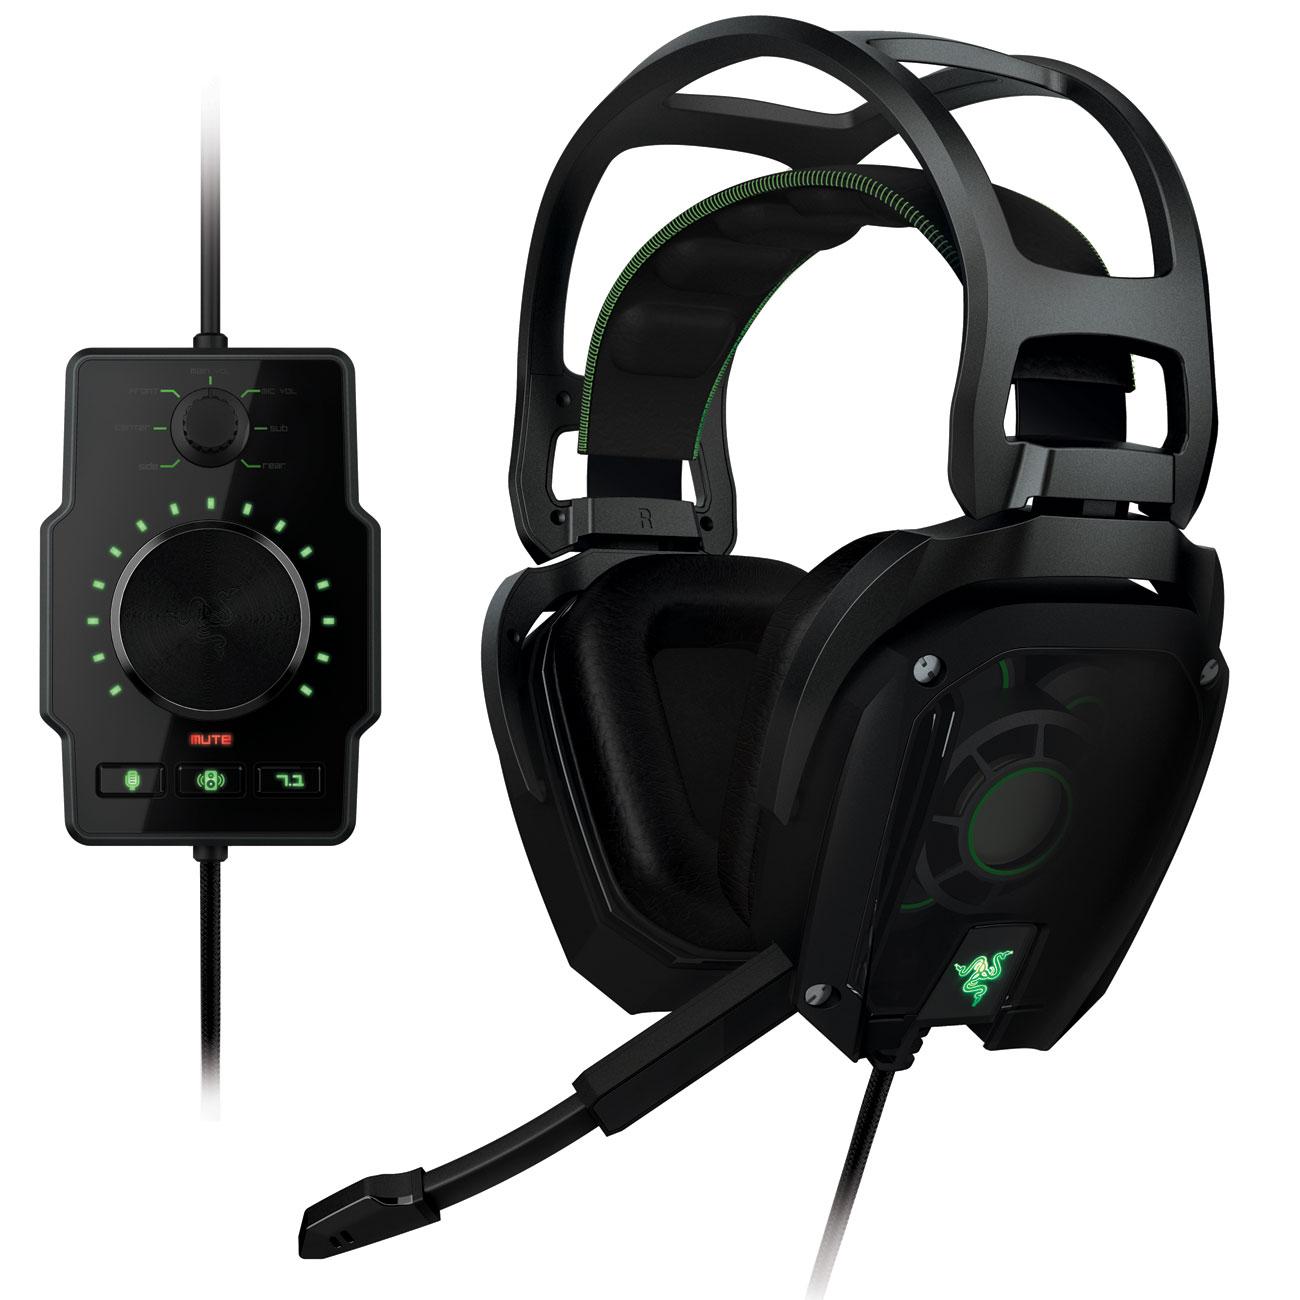 Razer Tiamat 7.1 V2 (RZ04-02070100-R3M1 **) - Achat / Vente Micro-casque sur Cybertek.fr - 0